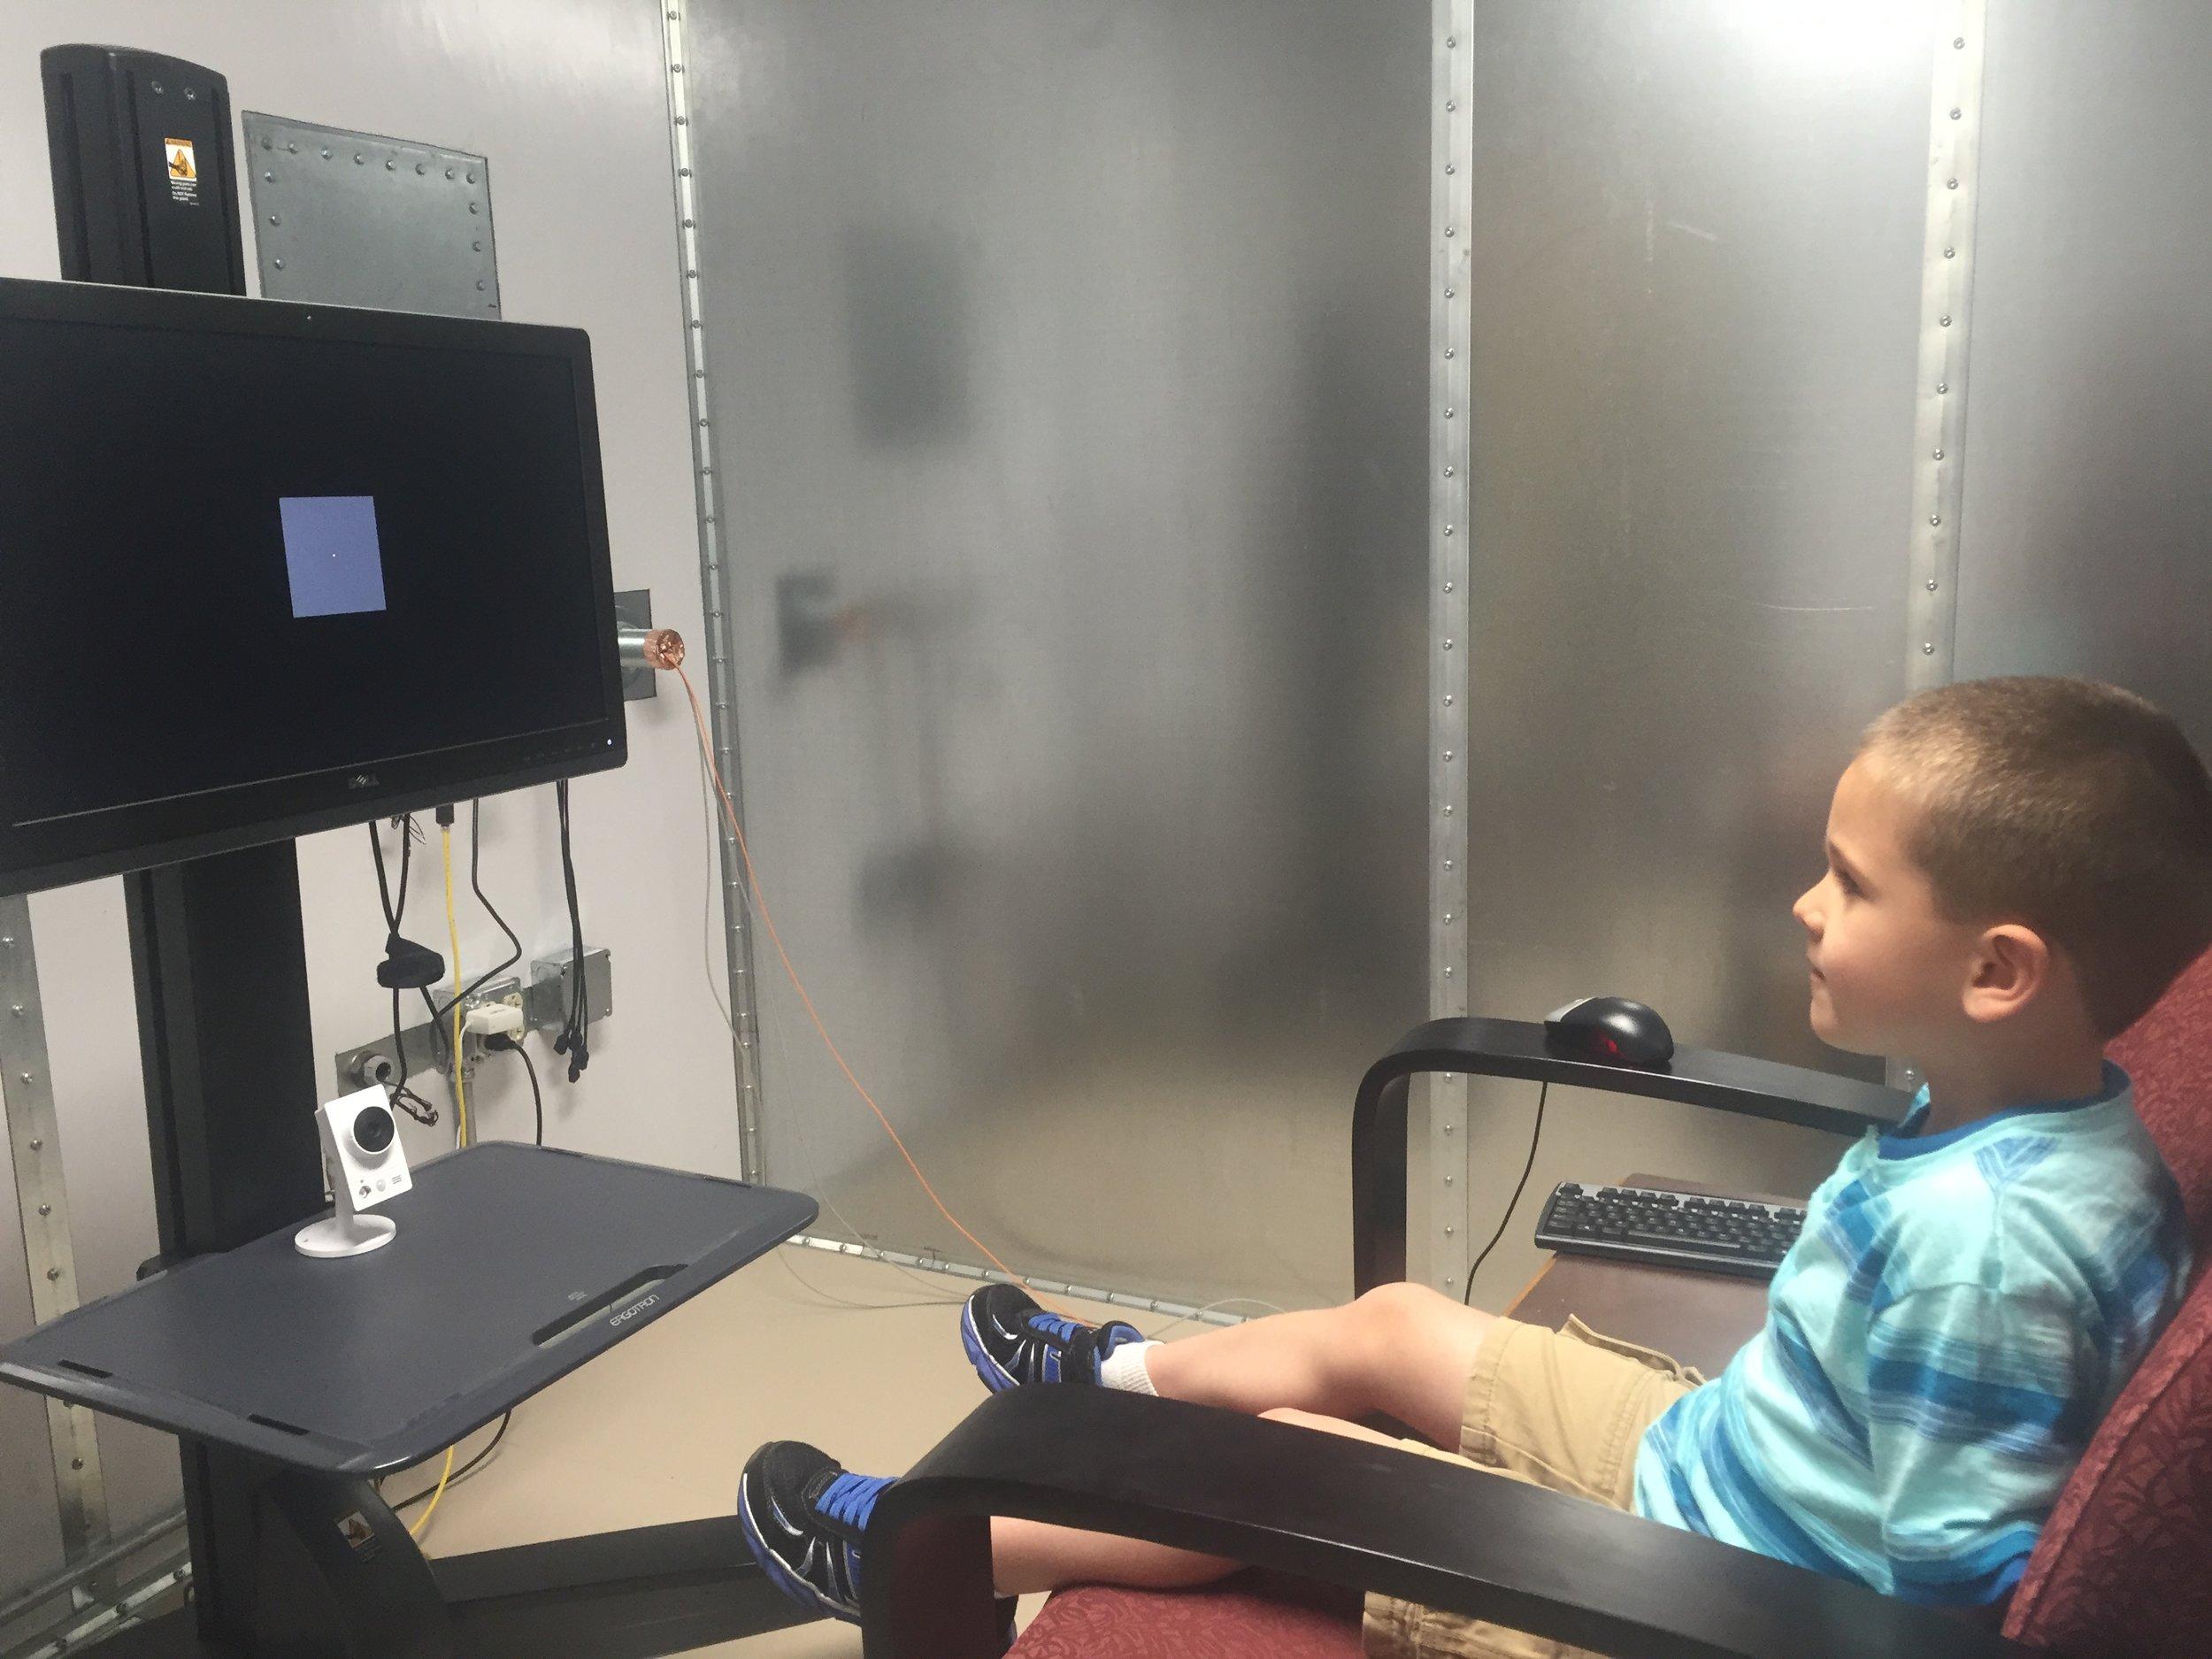 Damian Cognitive Neuroscience Lab | TetherAndFly.com